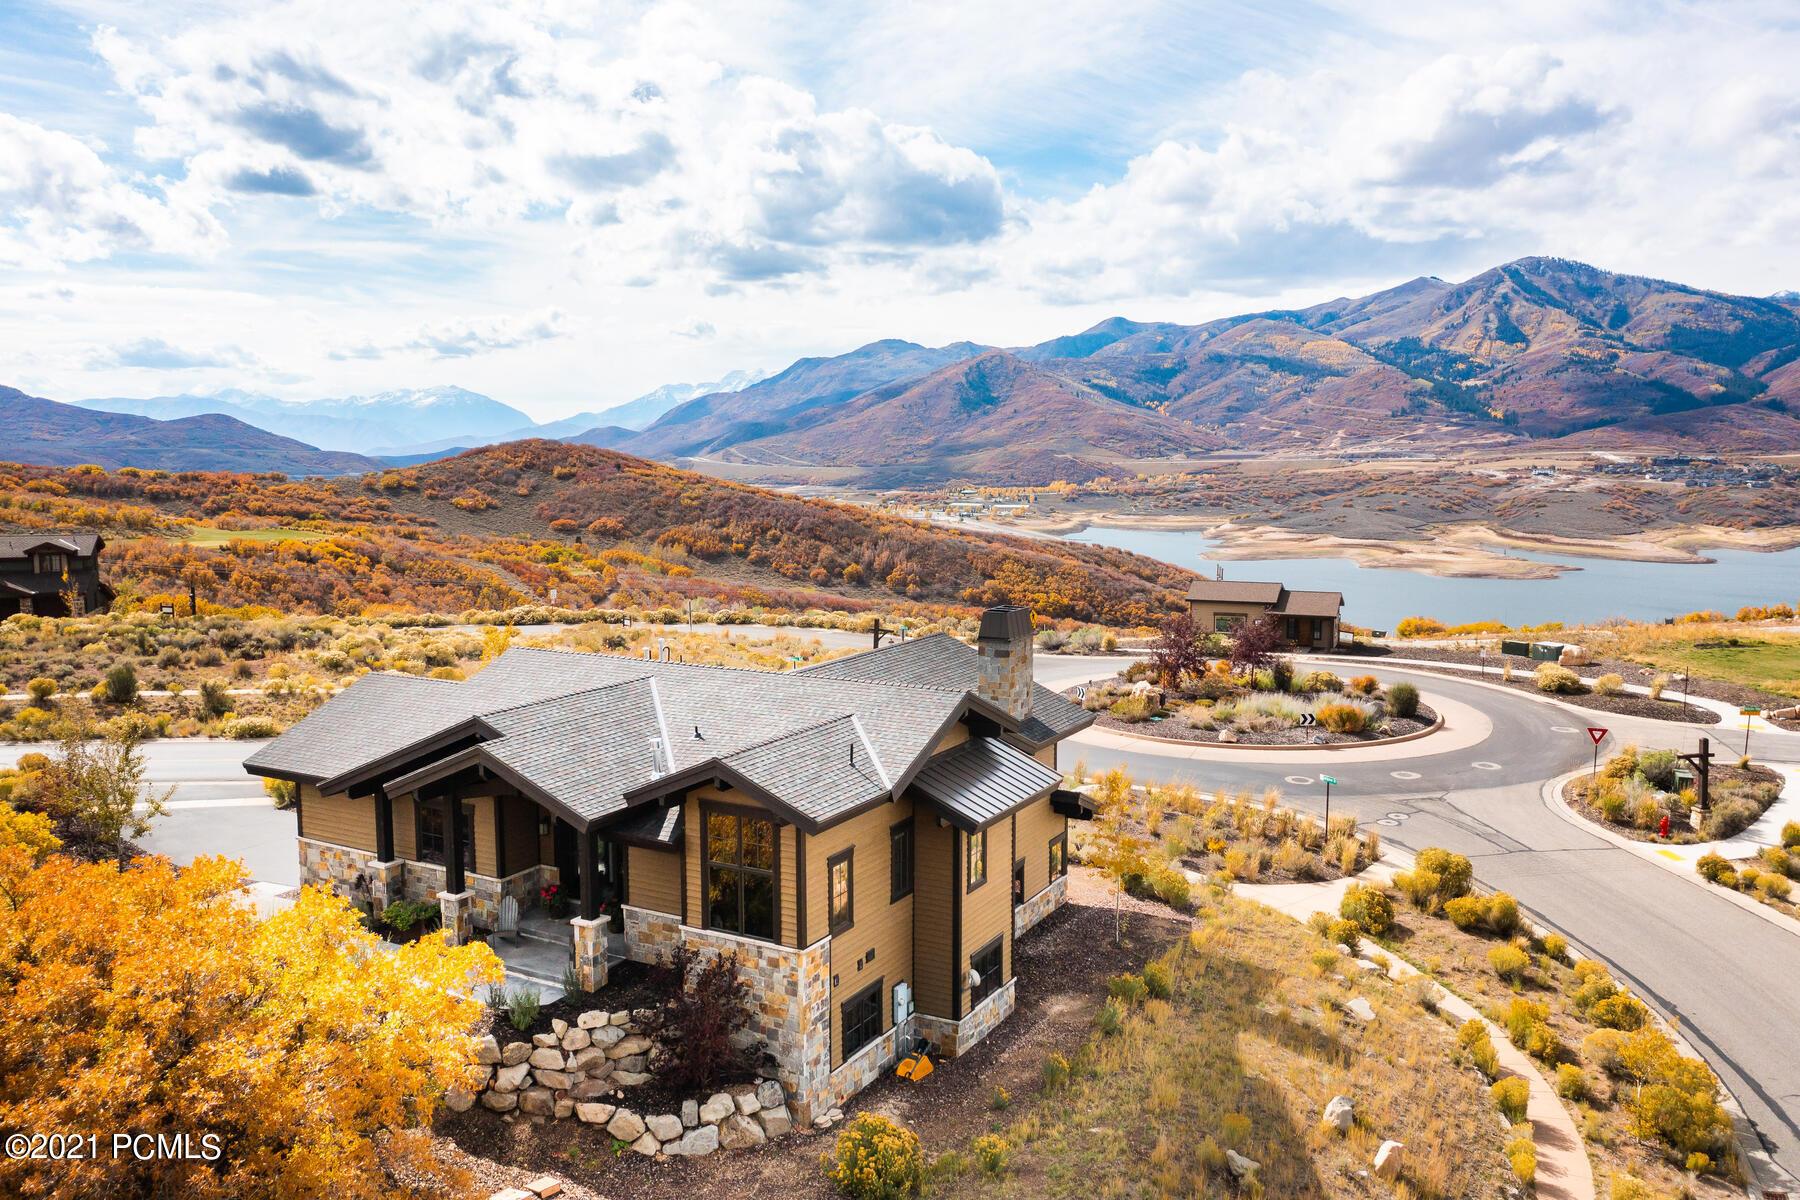 10725 Hideout Trail, Heber City, Utah 84032, 4 Bedrooms Bedrooms, ,4 BathroomsBathrooms,Single Family,For Sale,Hideout,12104144